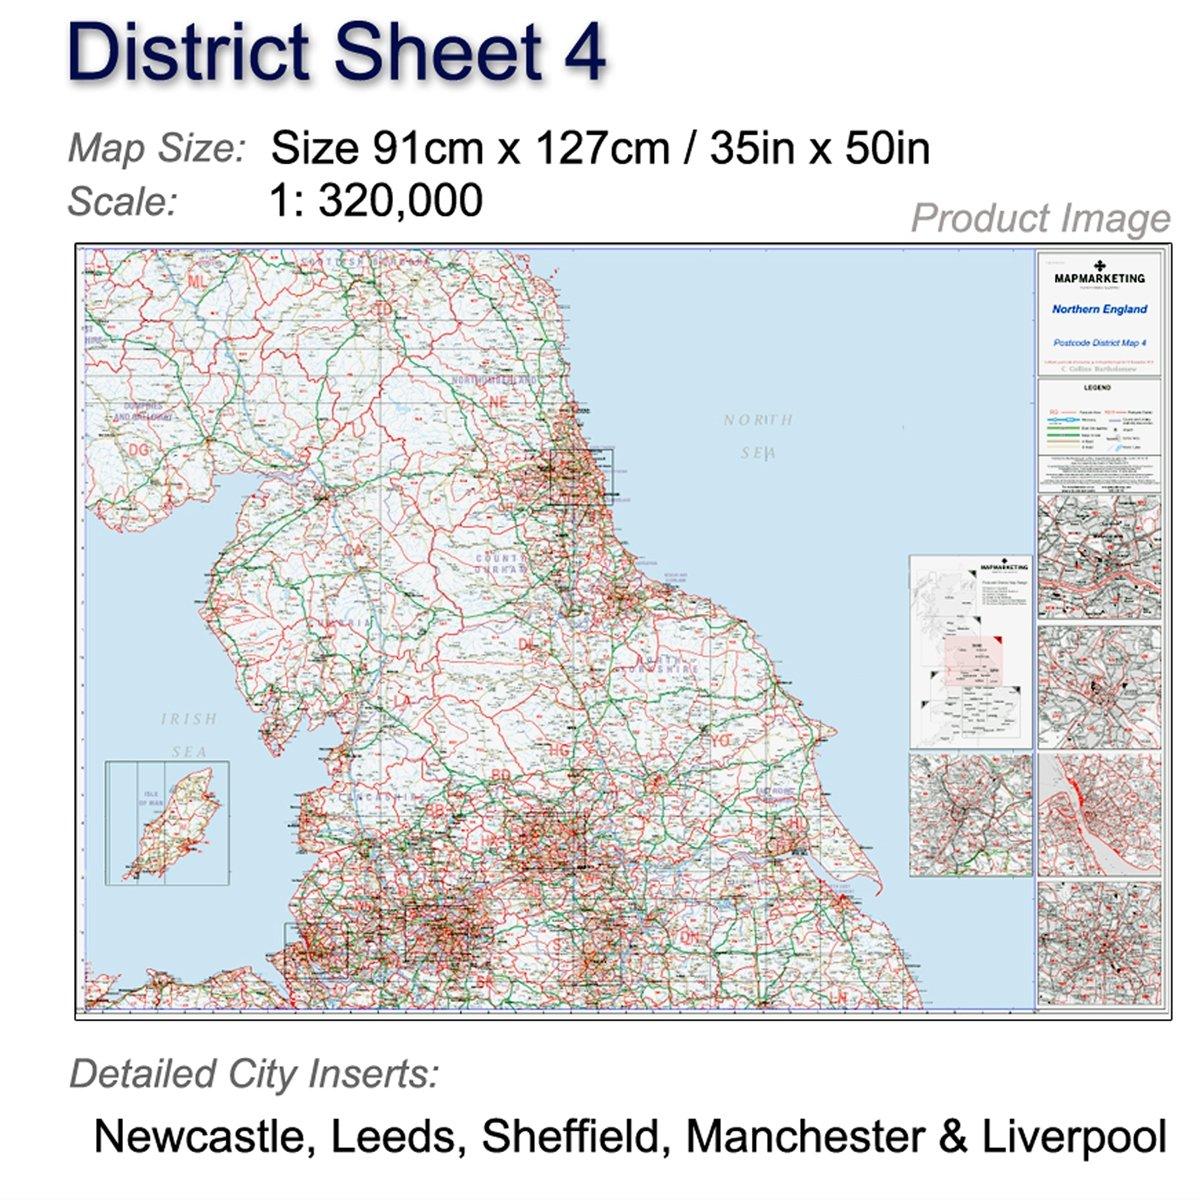 Map Of Northern England.Postcode District Map 4 Northern England Newcastle Upon Tyne Leeds